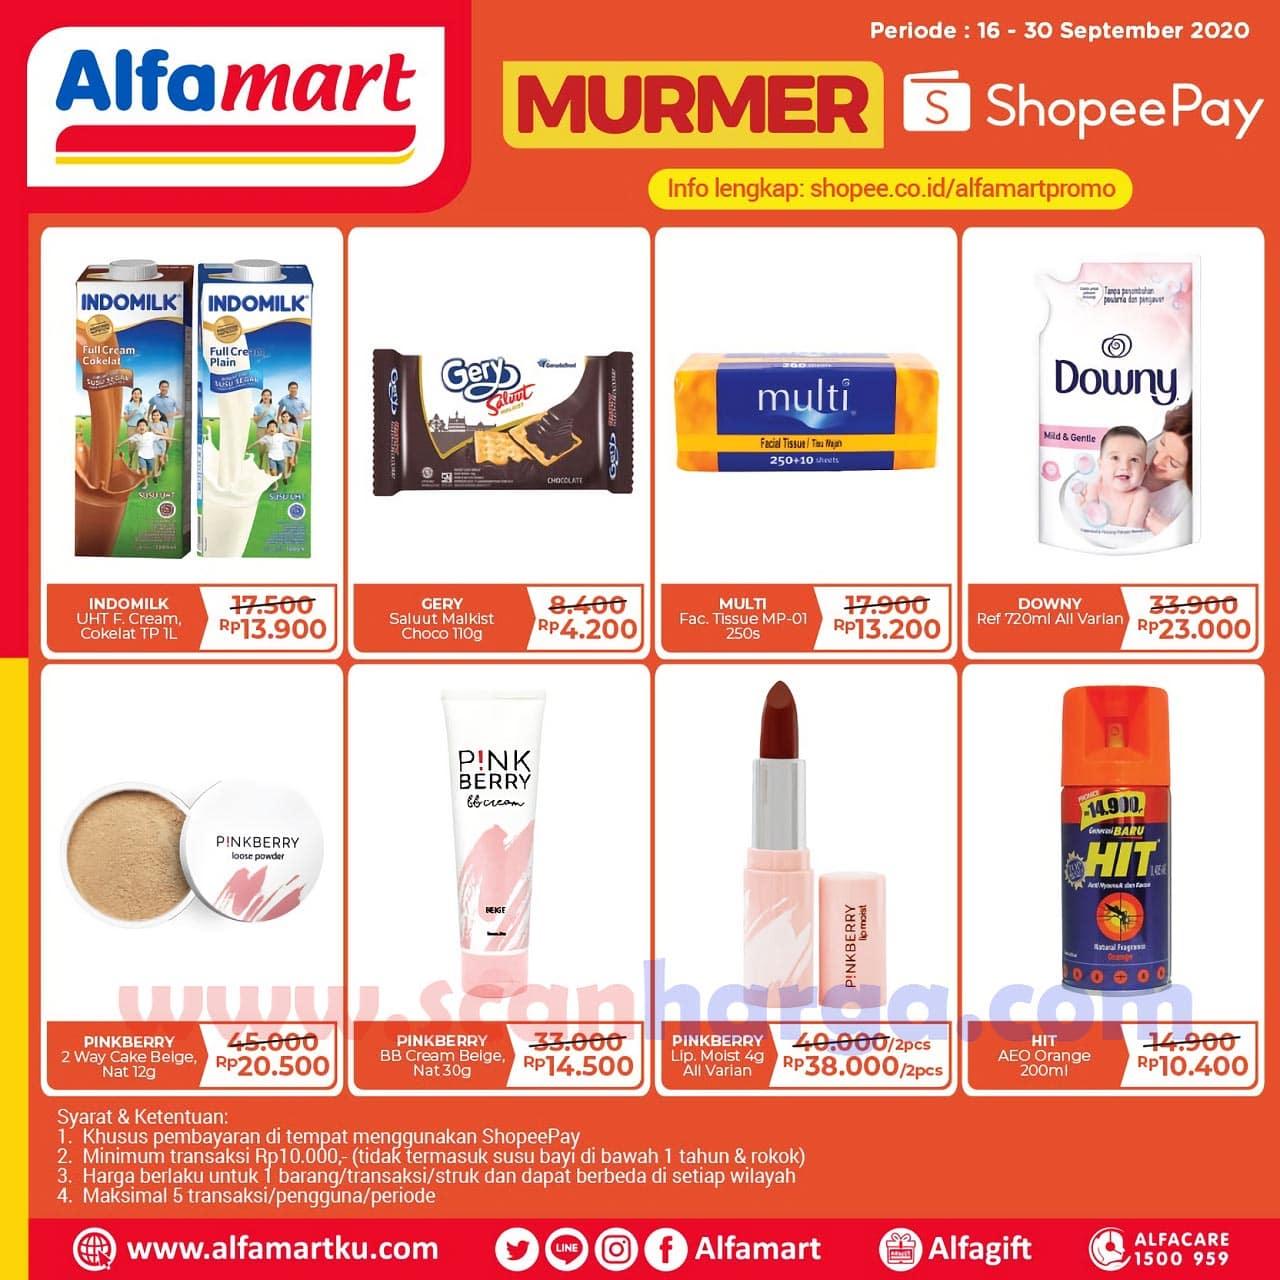 Promo Alfamart ShopeePay Murmer 16 - 30 September 2020